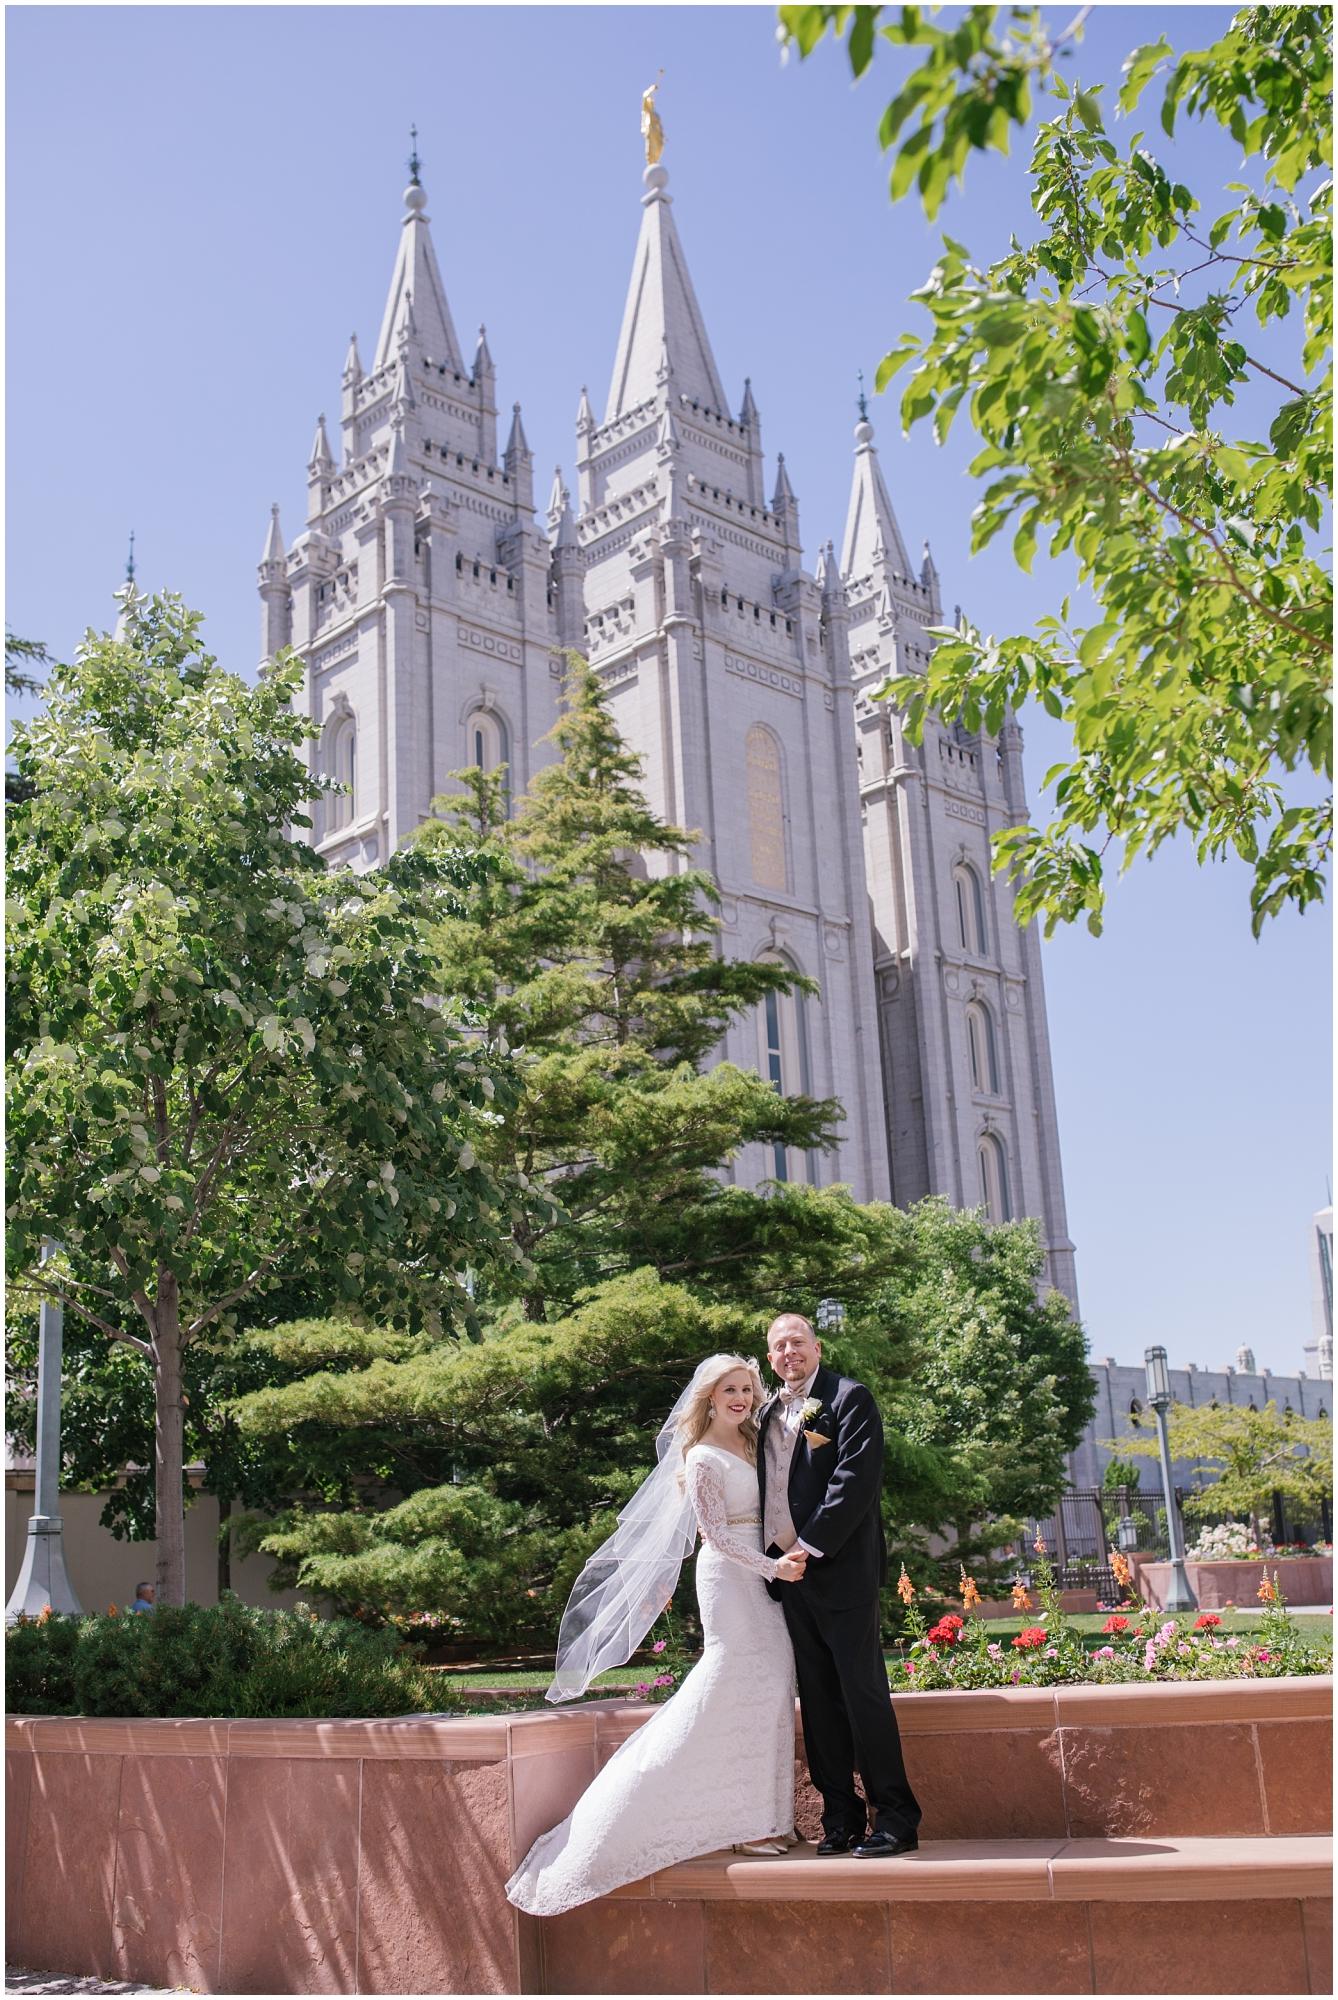 CherylandTyler-221_Lizzie-B-Imagery-Utah-Wedding-Photographer-Park-City-Salt-Lake-City-Temple-Wells-Fargo-Building.jpg